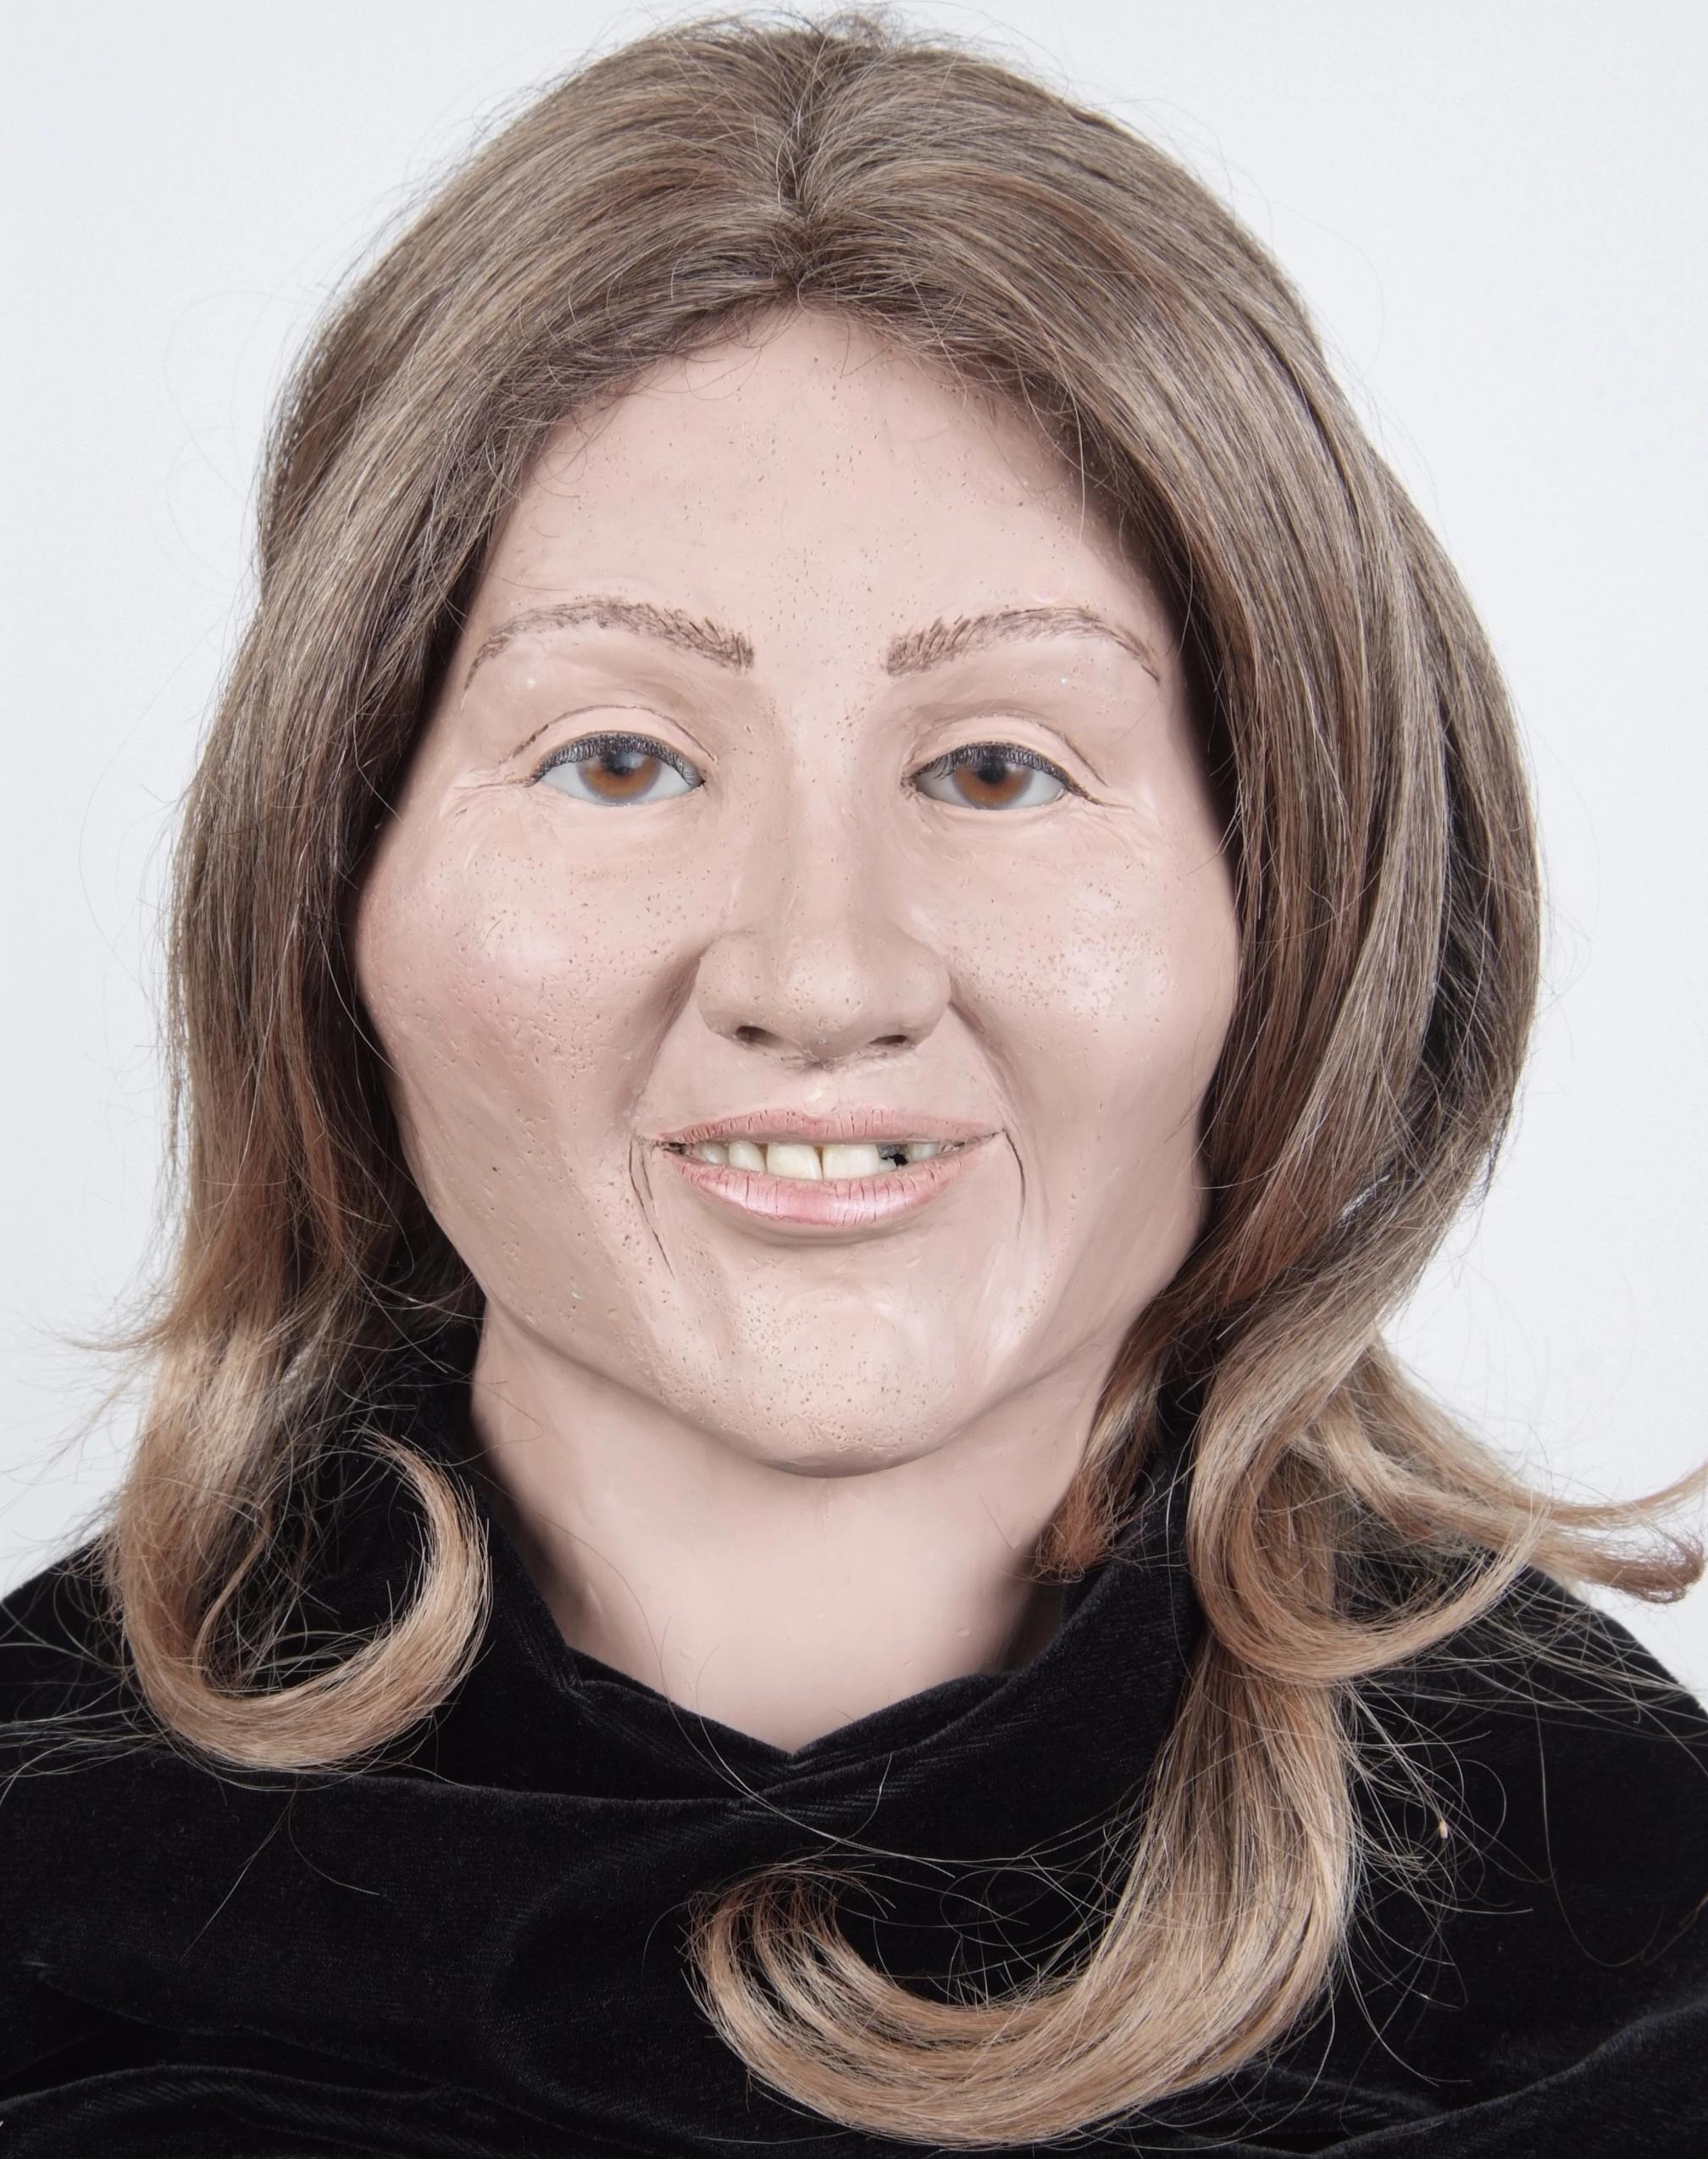 Kent County Jane Doe (July 20, 1997)